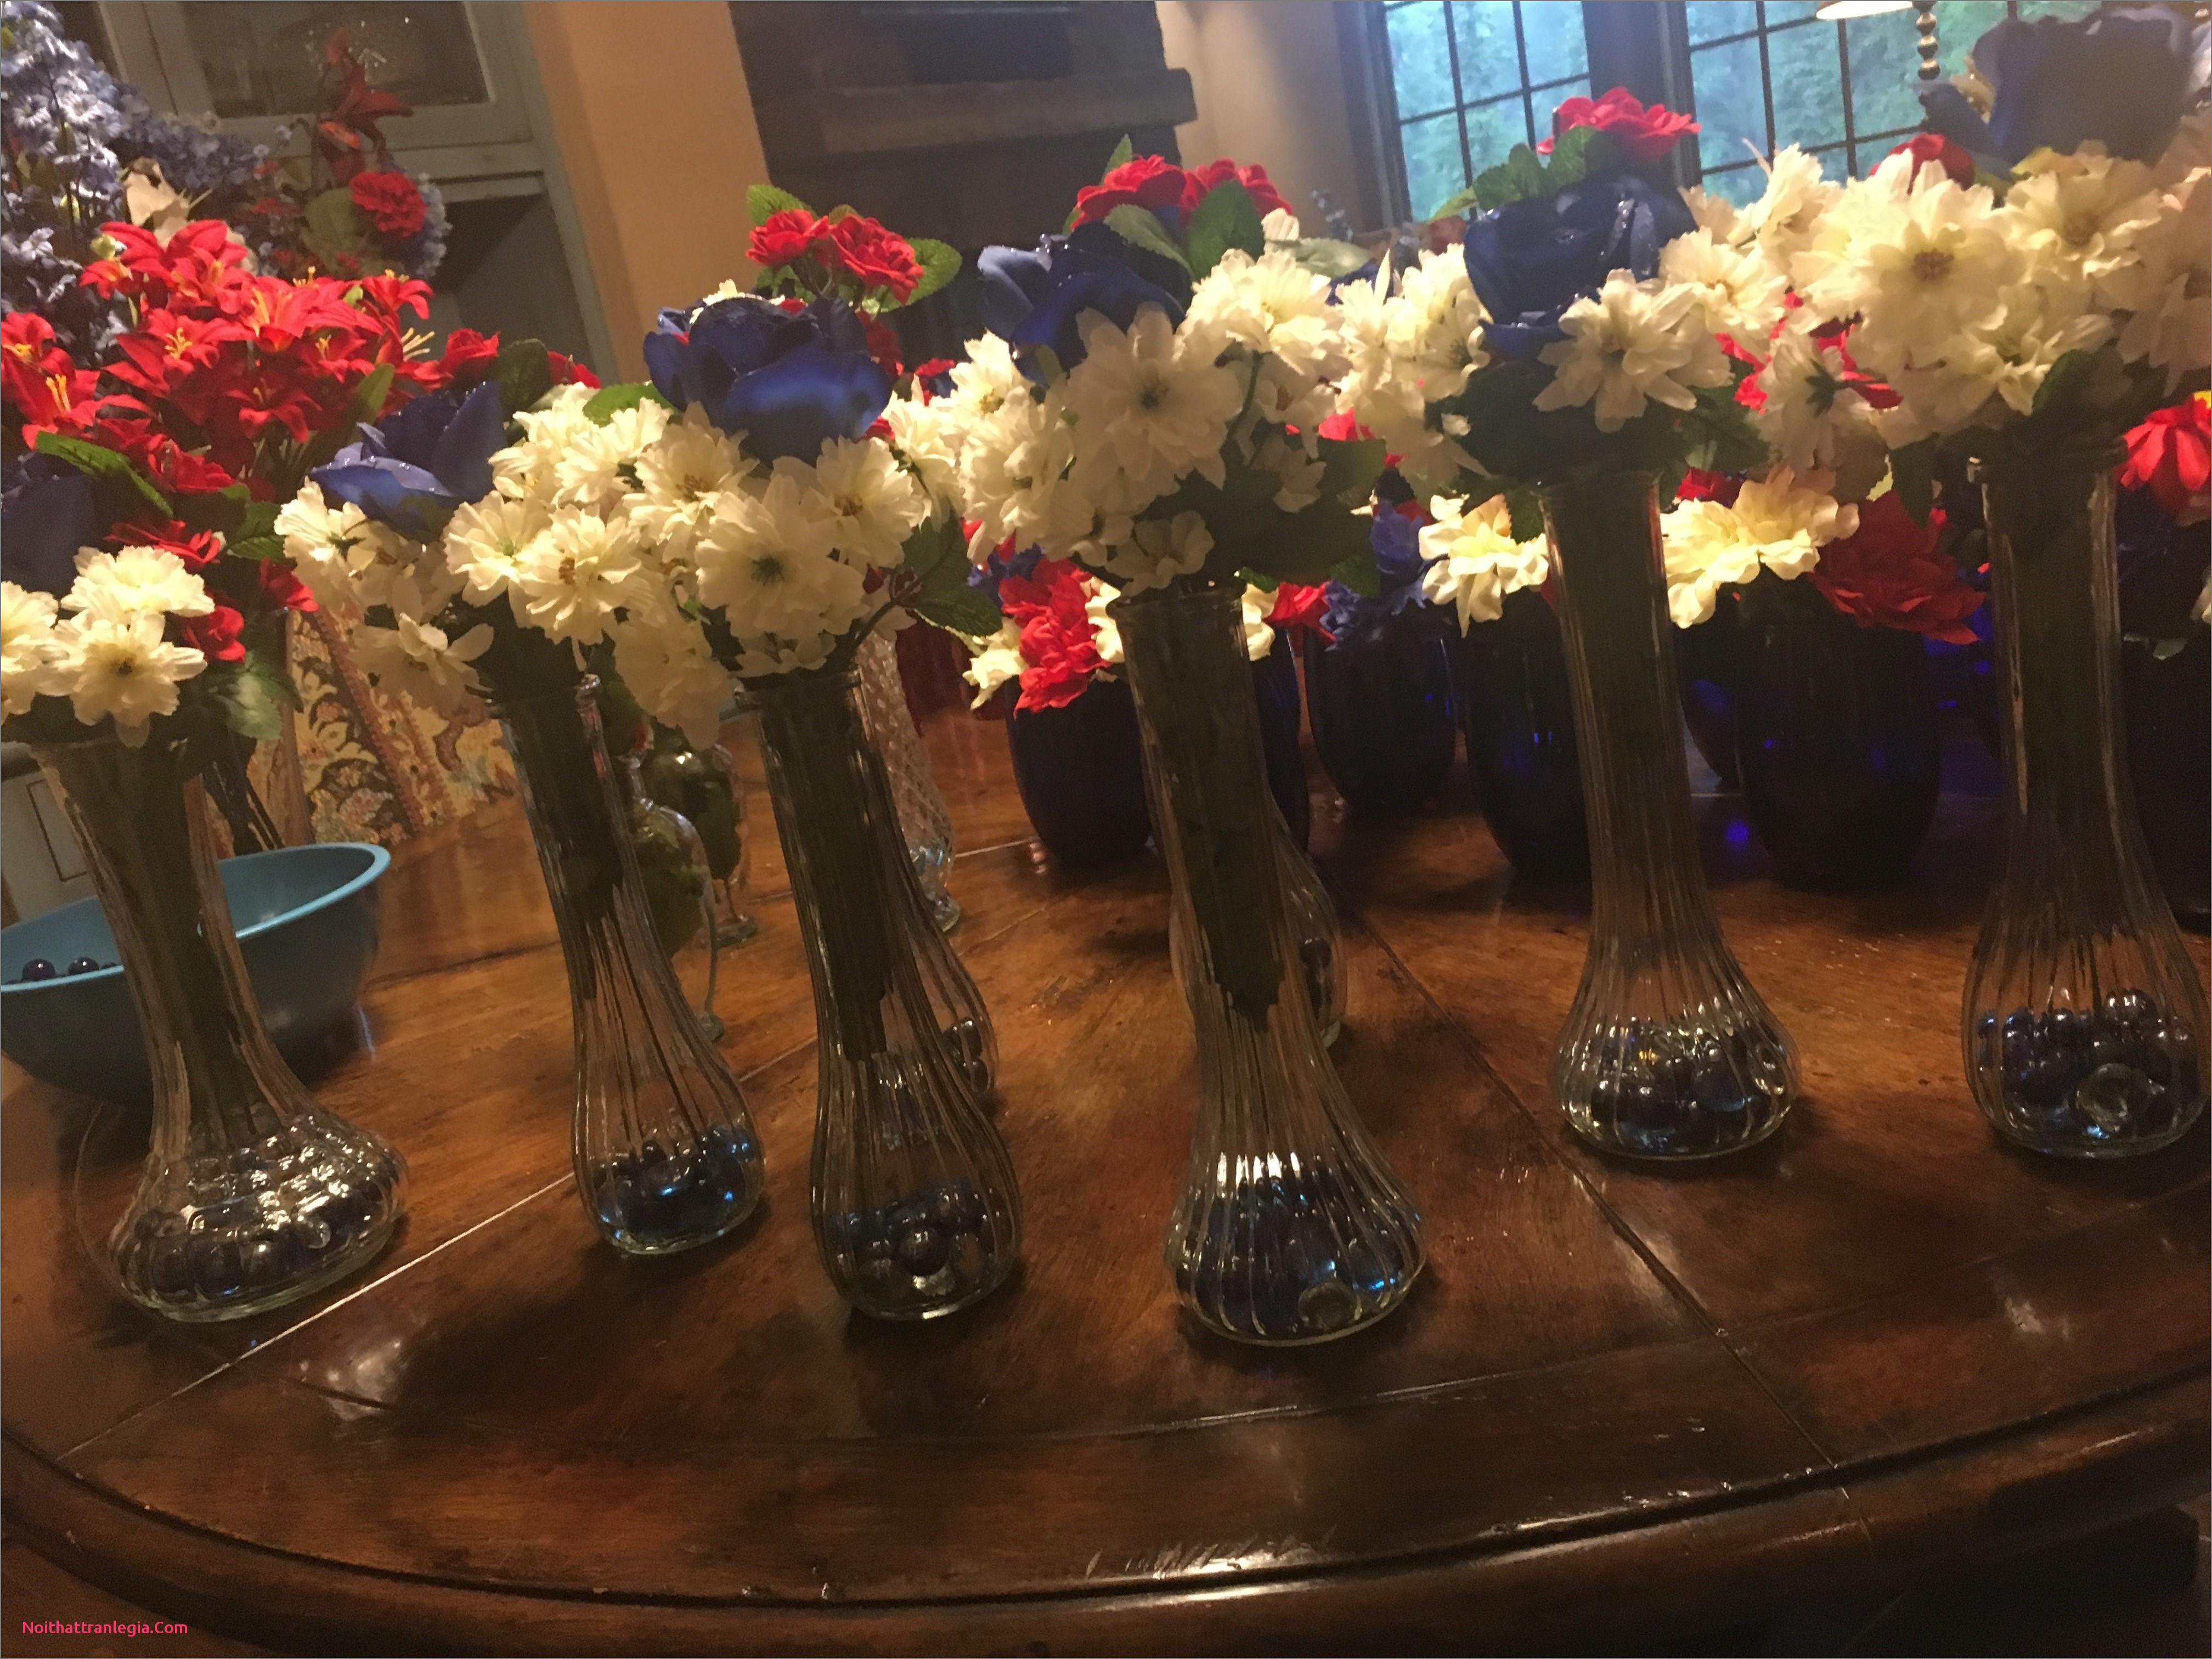 dollar store square vases of 20 wedding vases noithattranlegia vases design regarding decoration line luxury dollar tree wedding decorations awesome h vases dollar vase i 0d